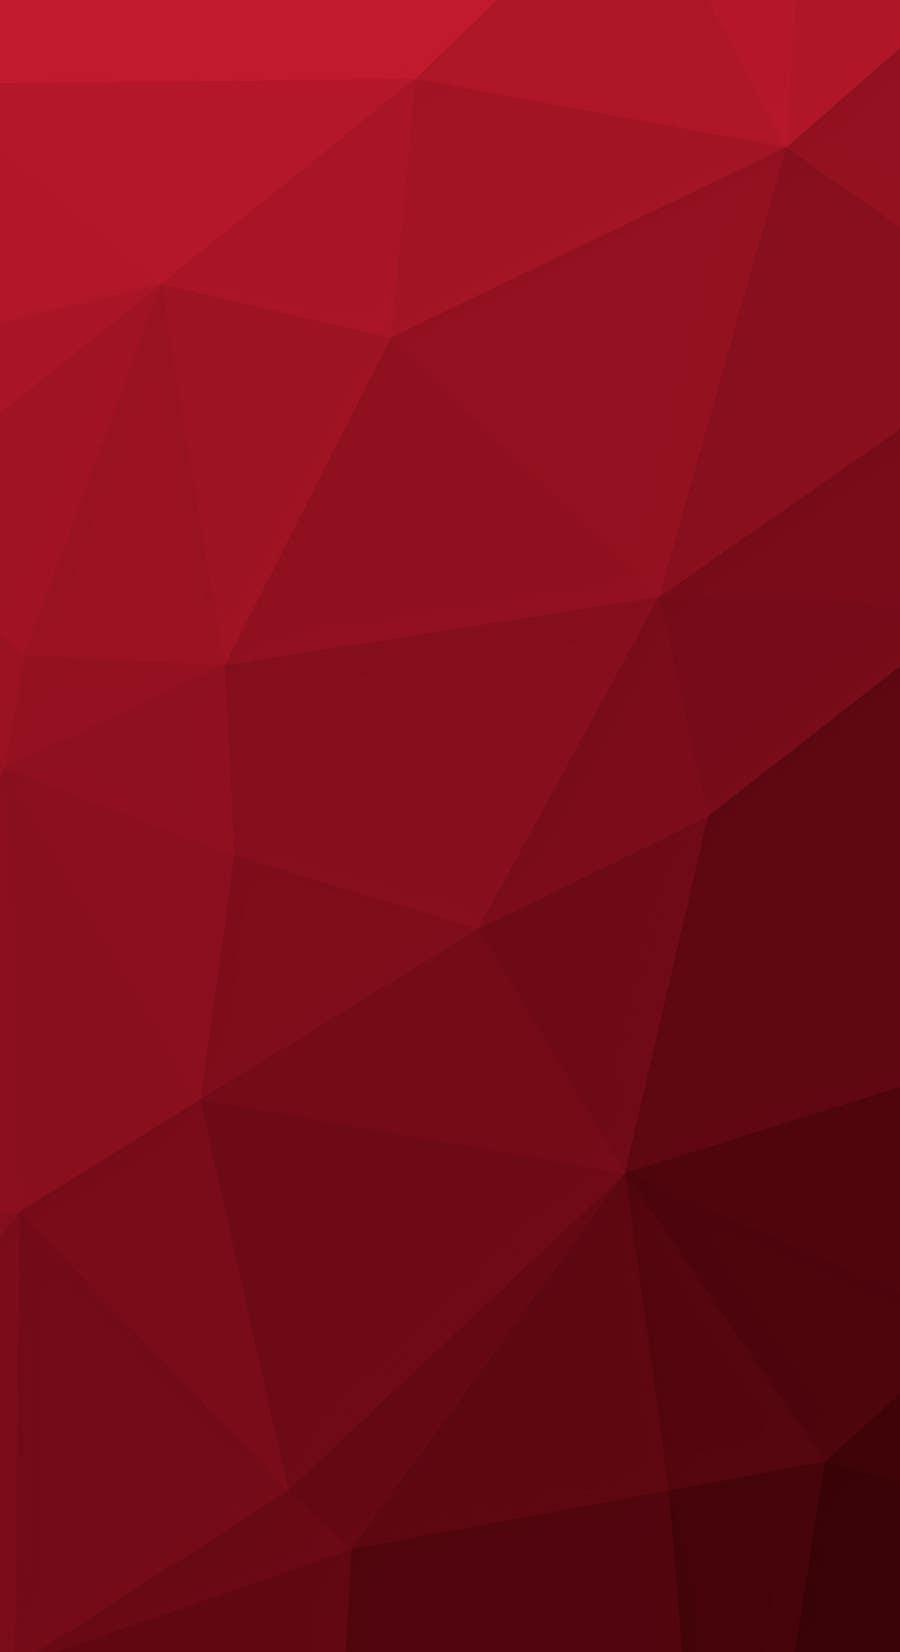 Konkurrenceindlæg #                                        23                                      for                                         Background image: graphic/geometric design needed